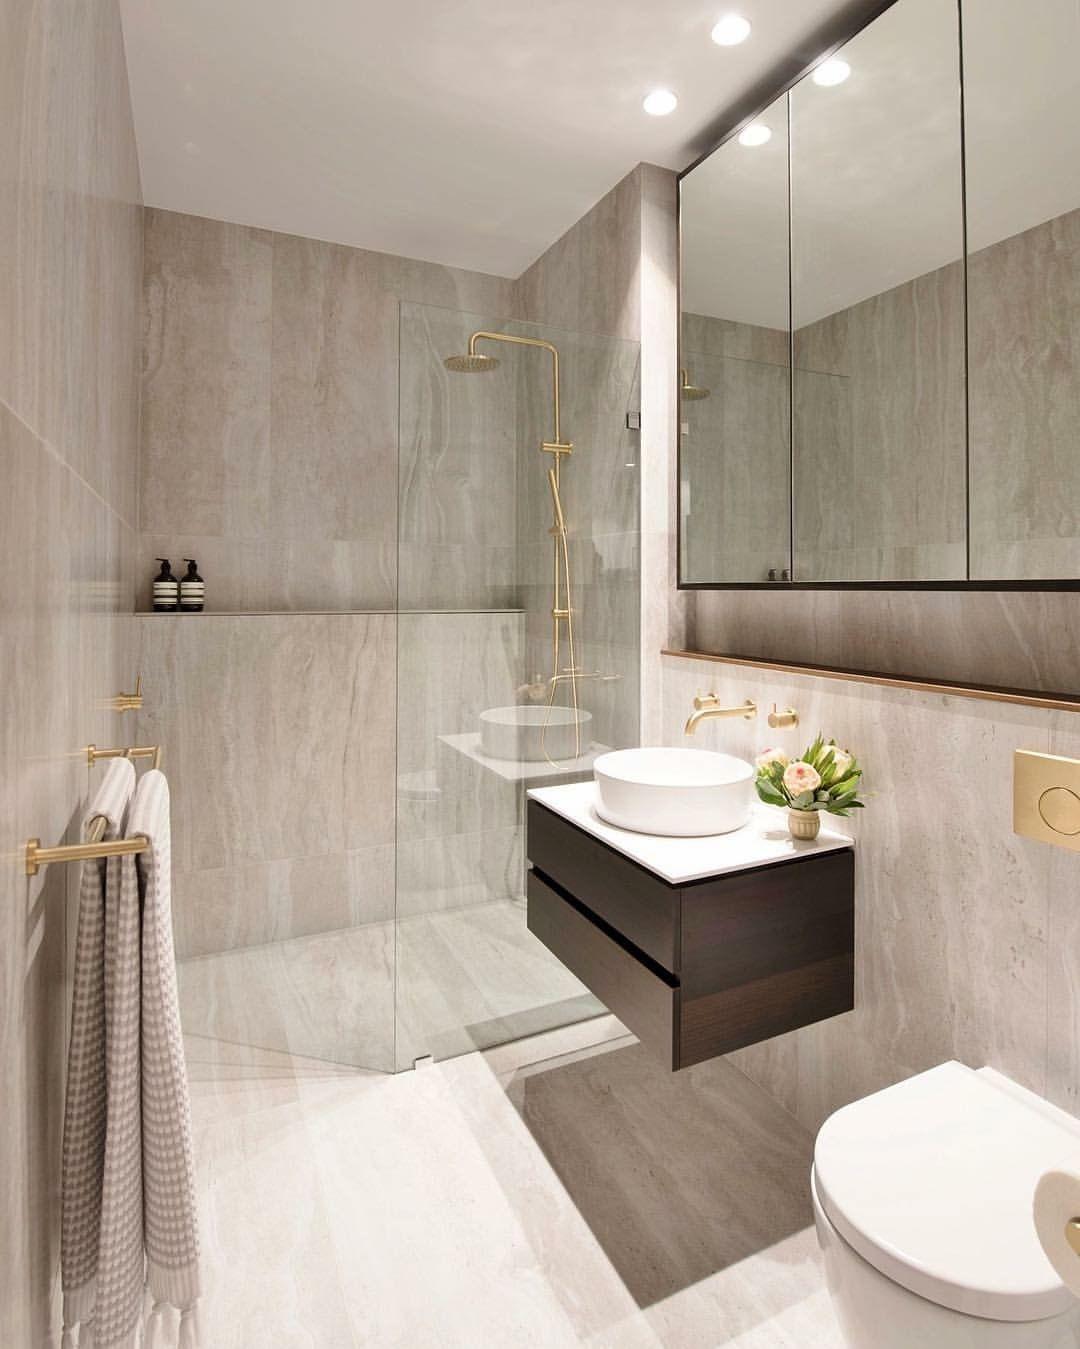 Master bedroom ensuite ideas  Pin by Zaza George on Luxury Decor u Design  Pinterest  Master